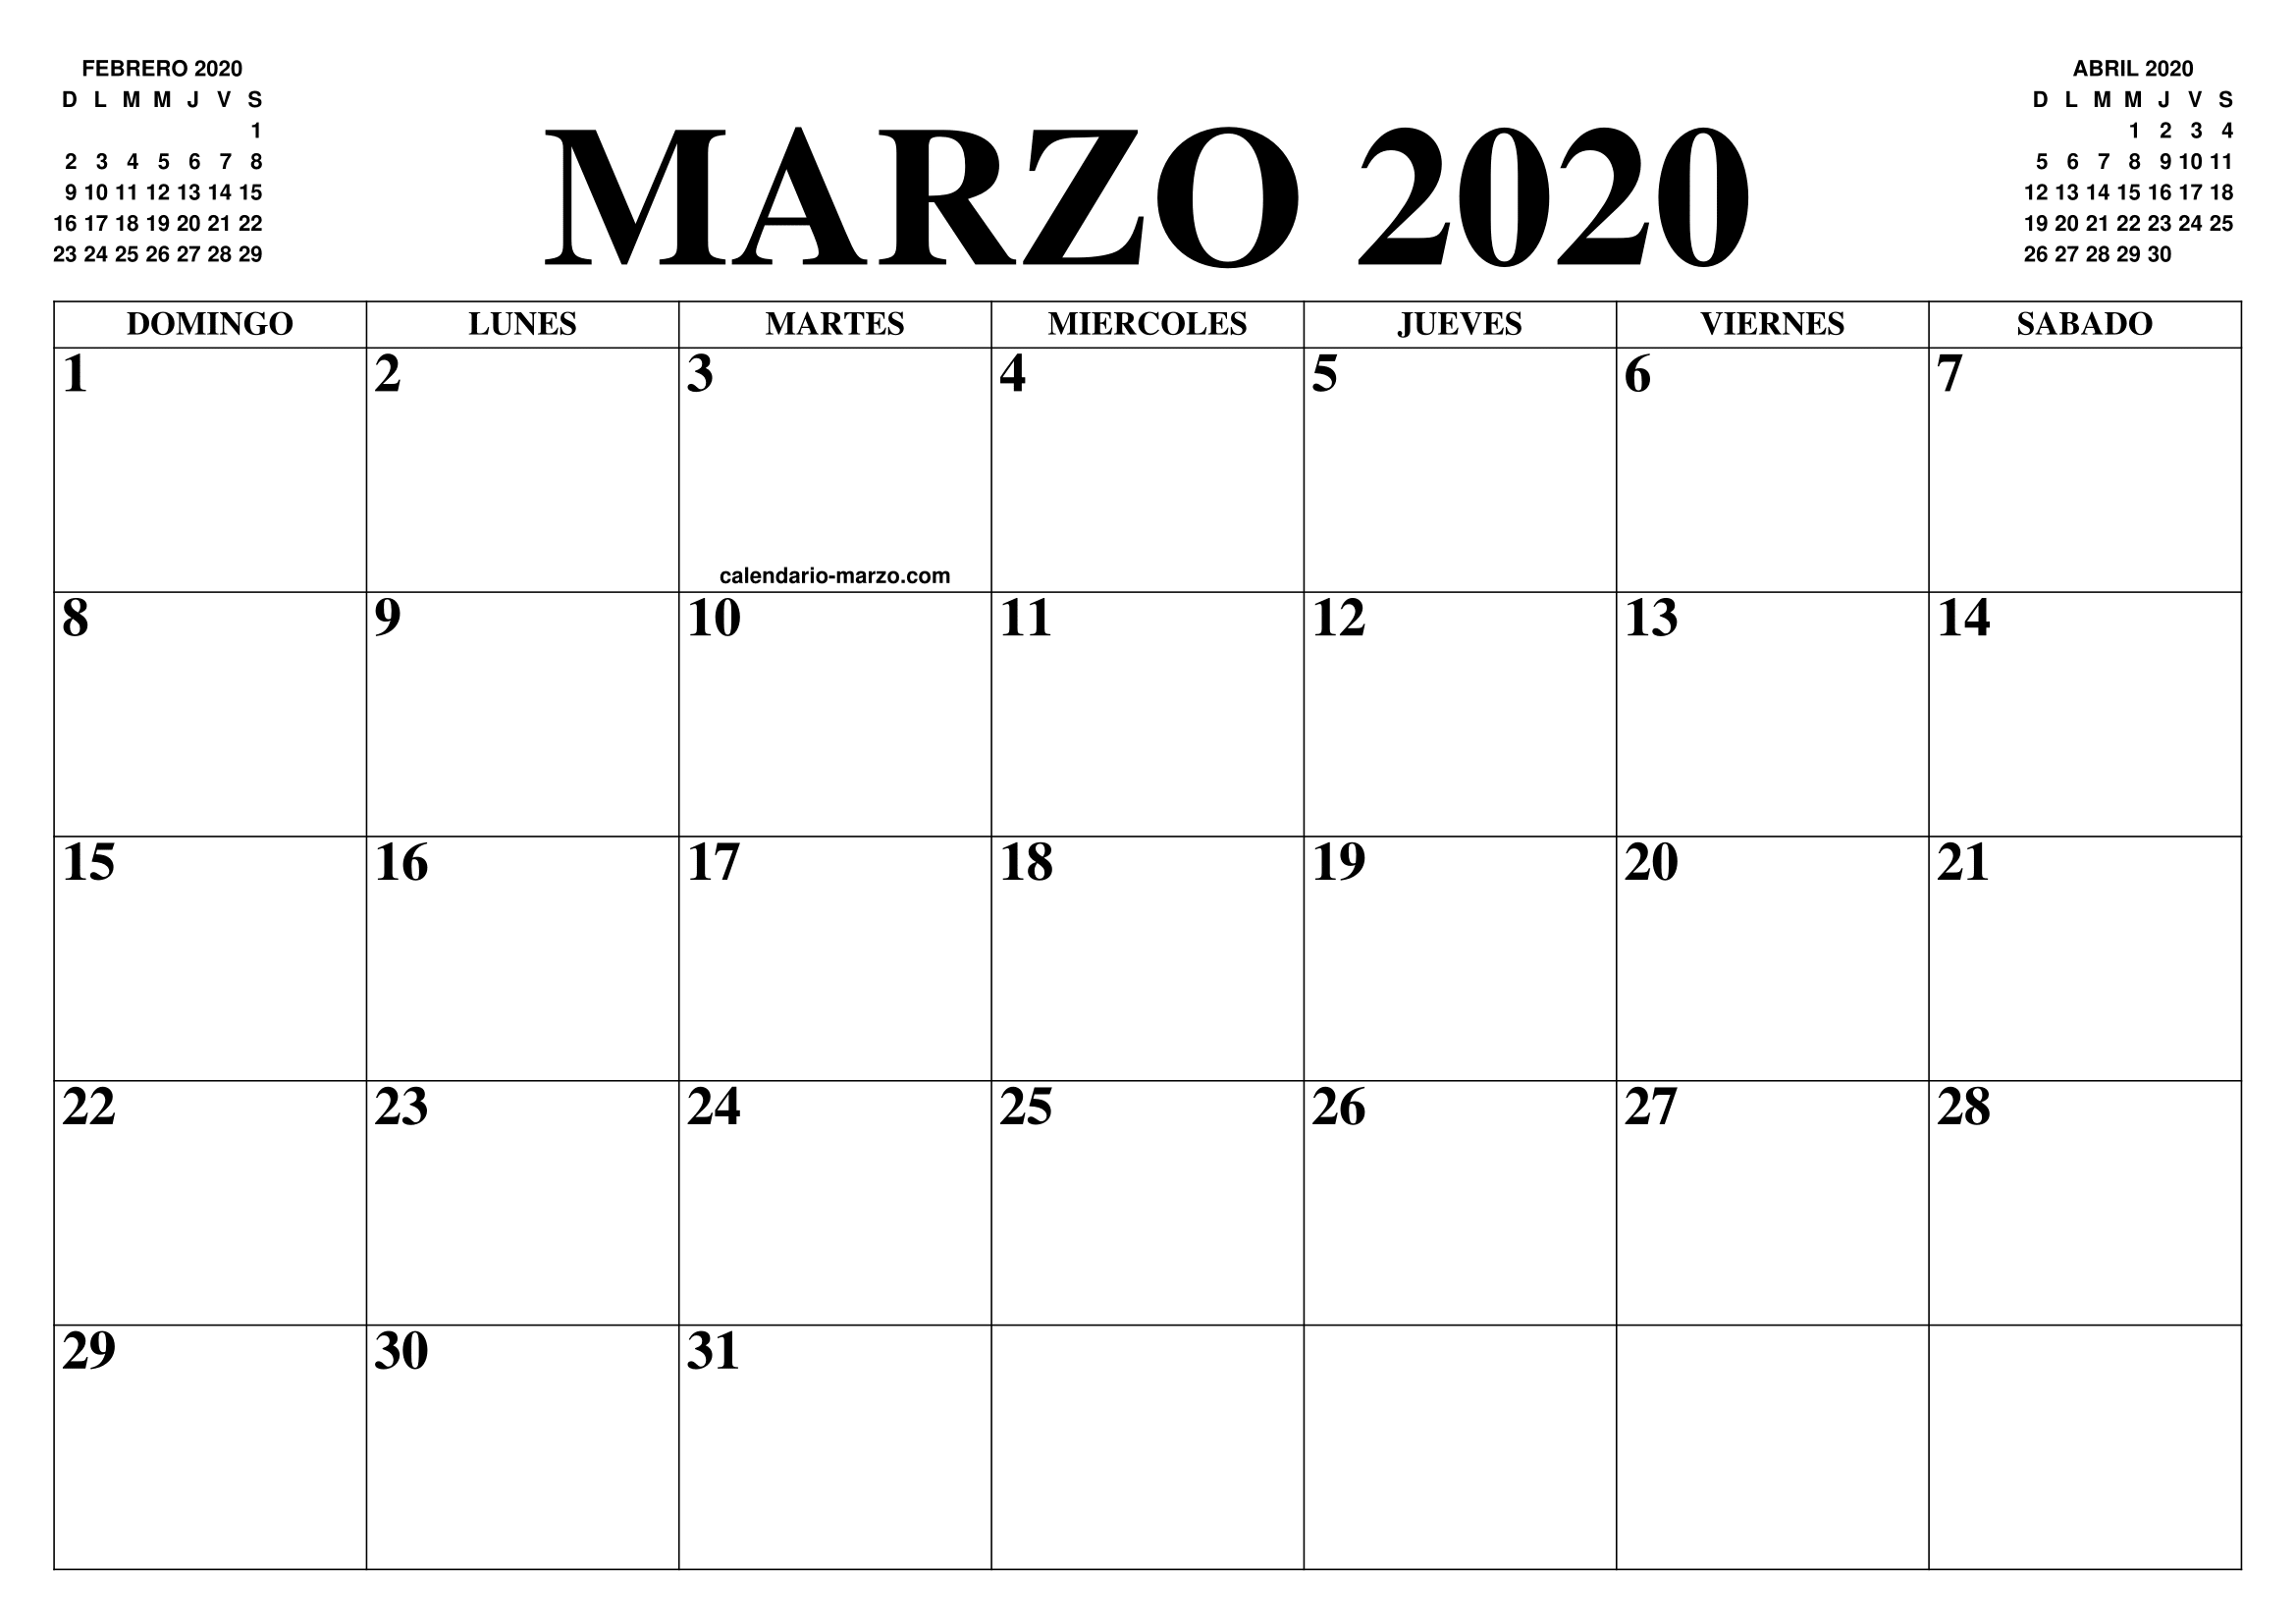 Calendario Agenda 2020 Para Imprimir.Calendario Marzo 2020 El Calendario Marzo Para Imprimir